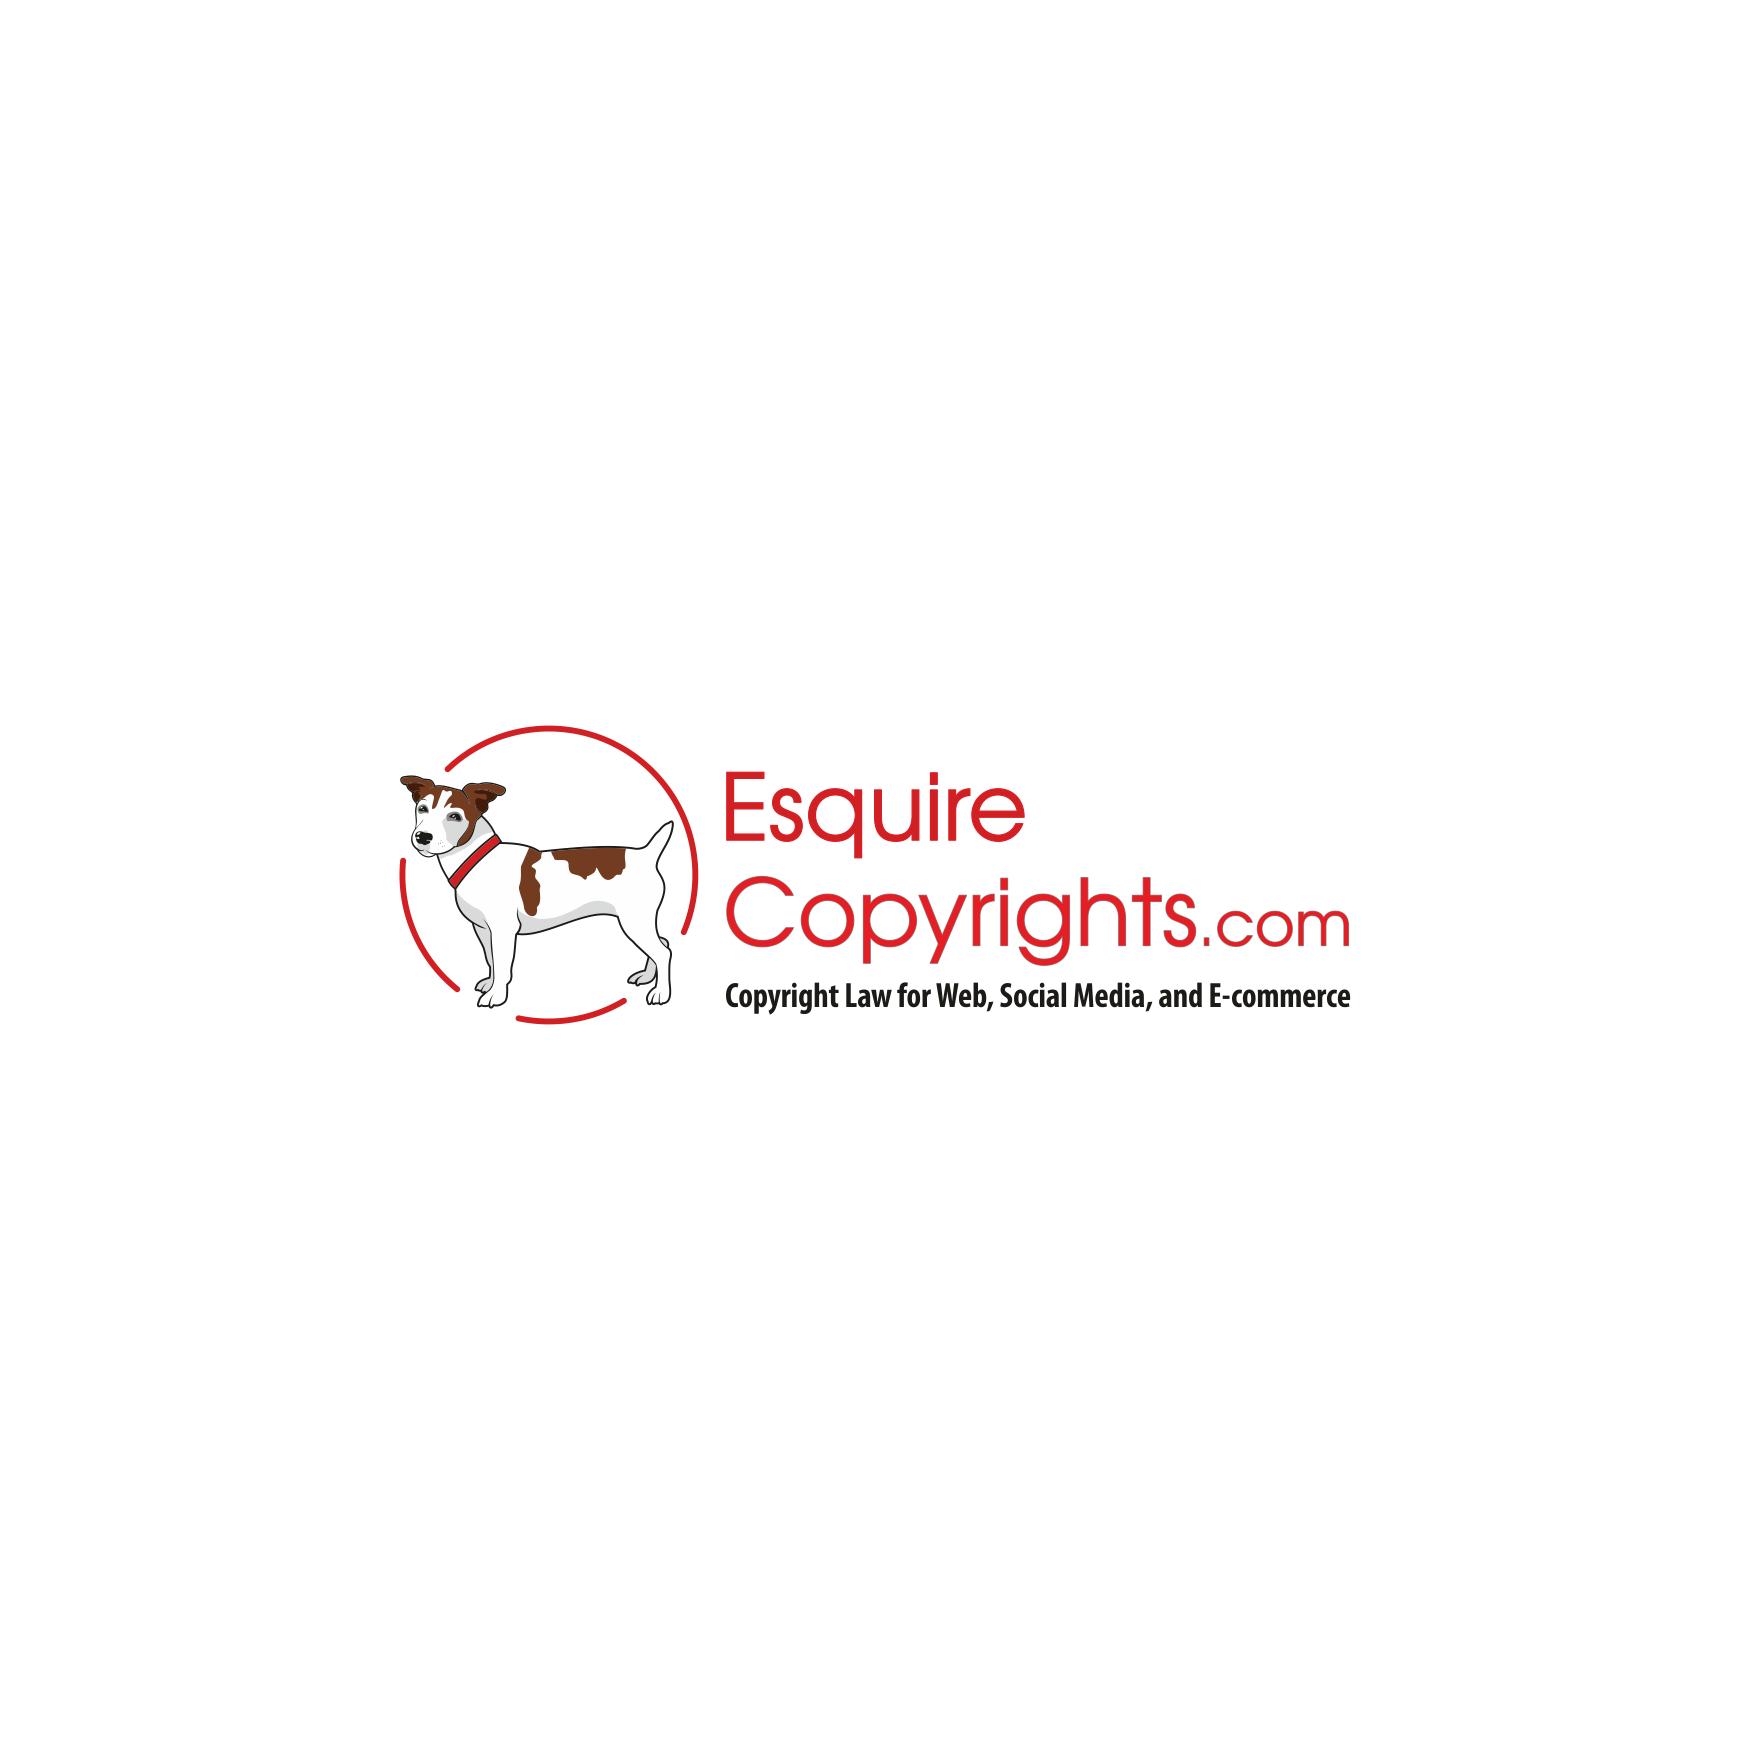 Dog Wesley's Logo for EsquireCopyrights.com